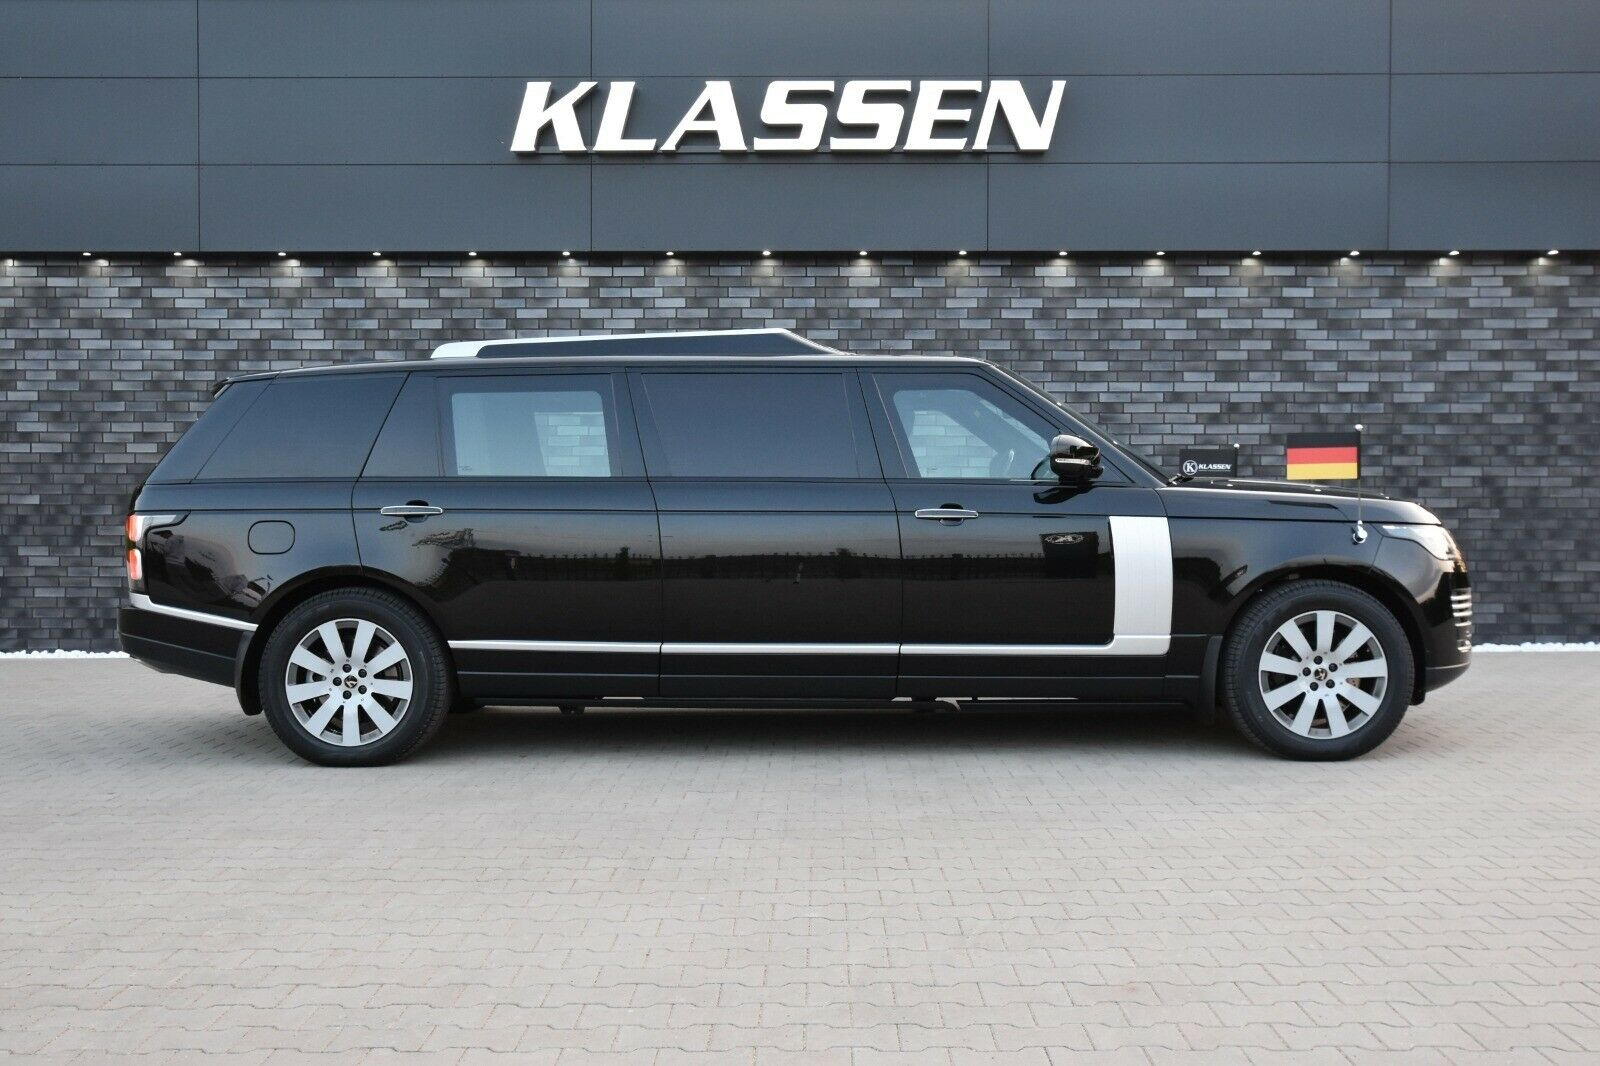 Range-Rover-SVAutobiography-by-Klassen-3